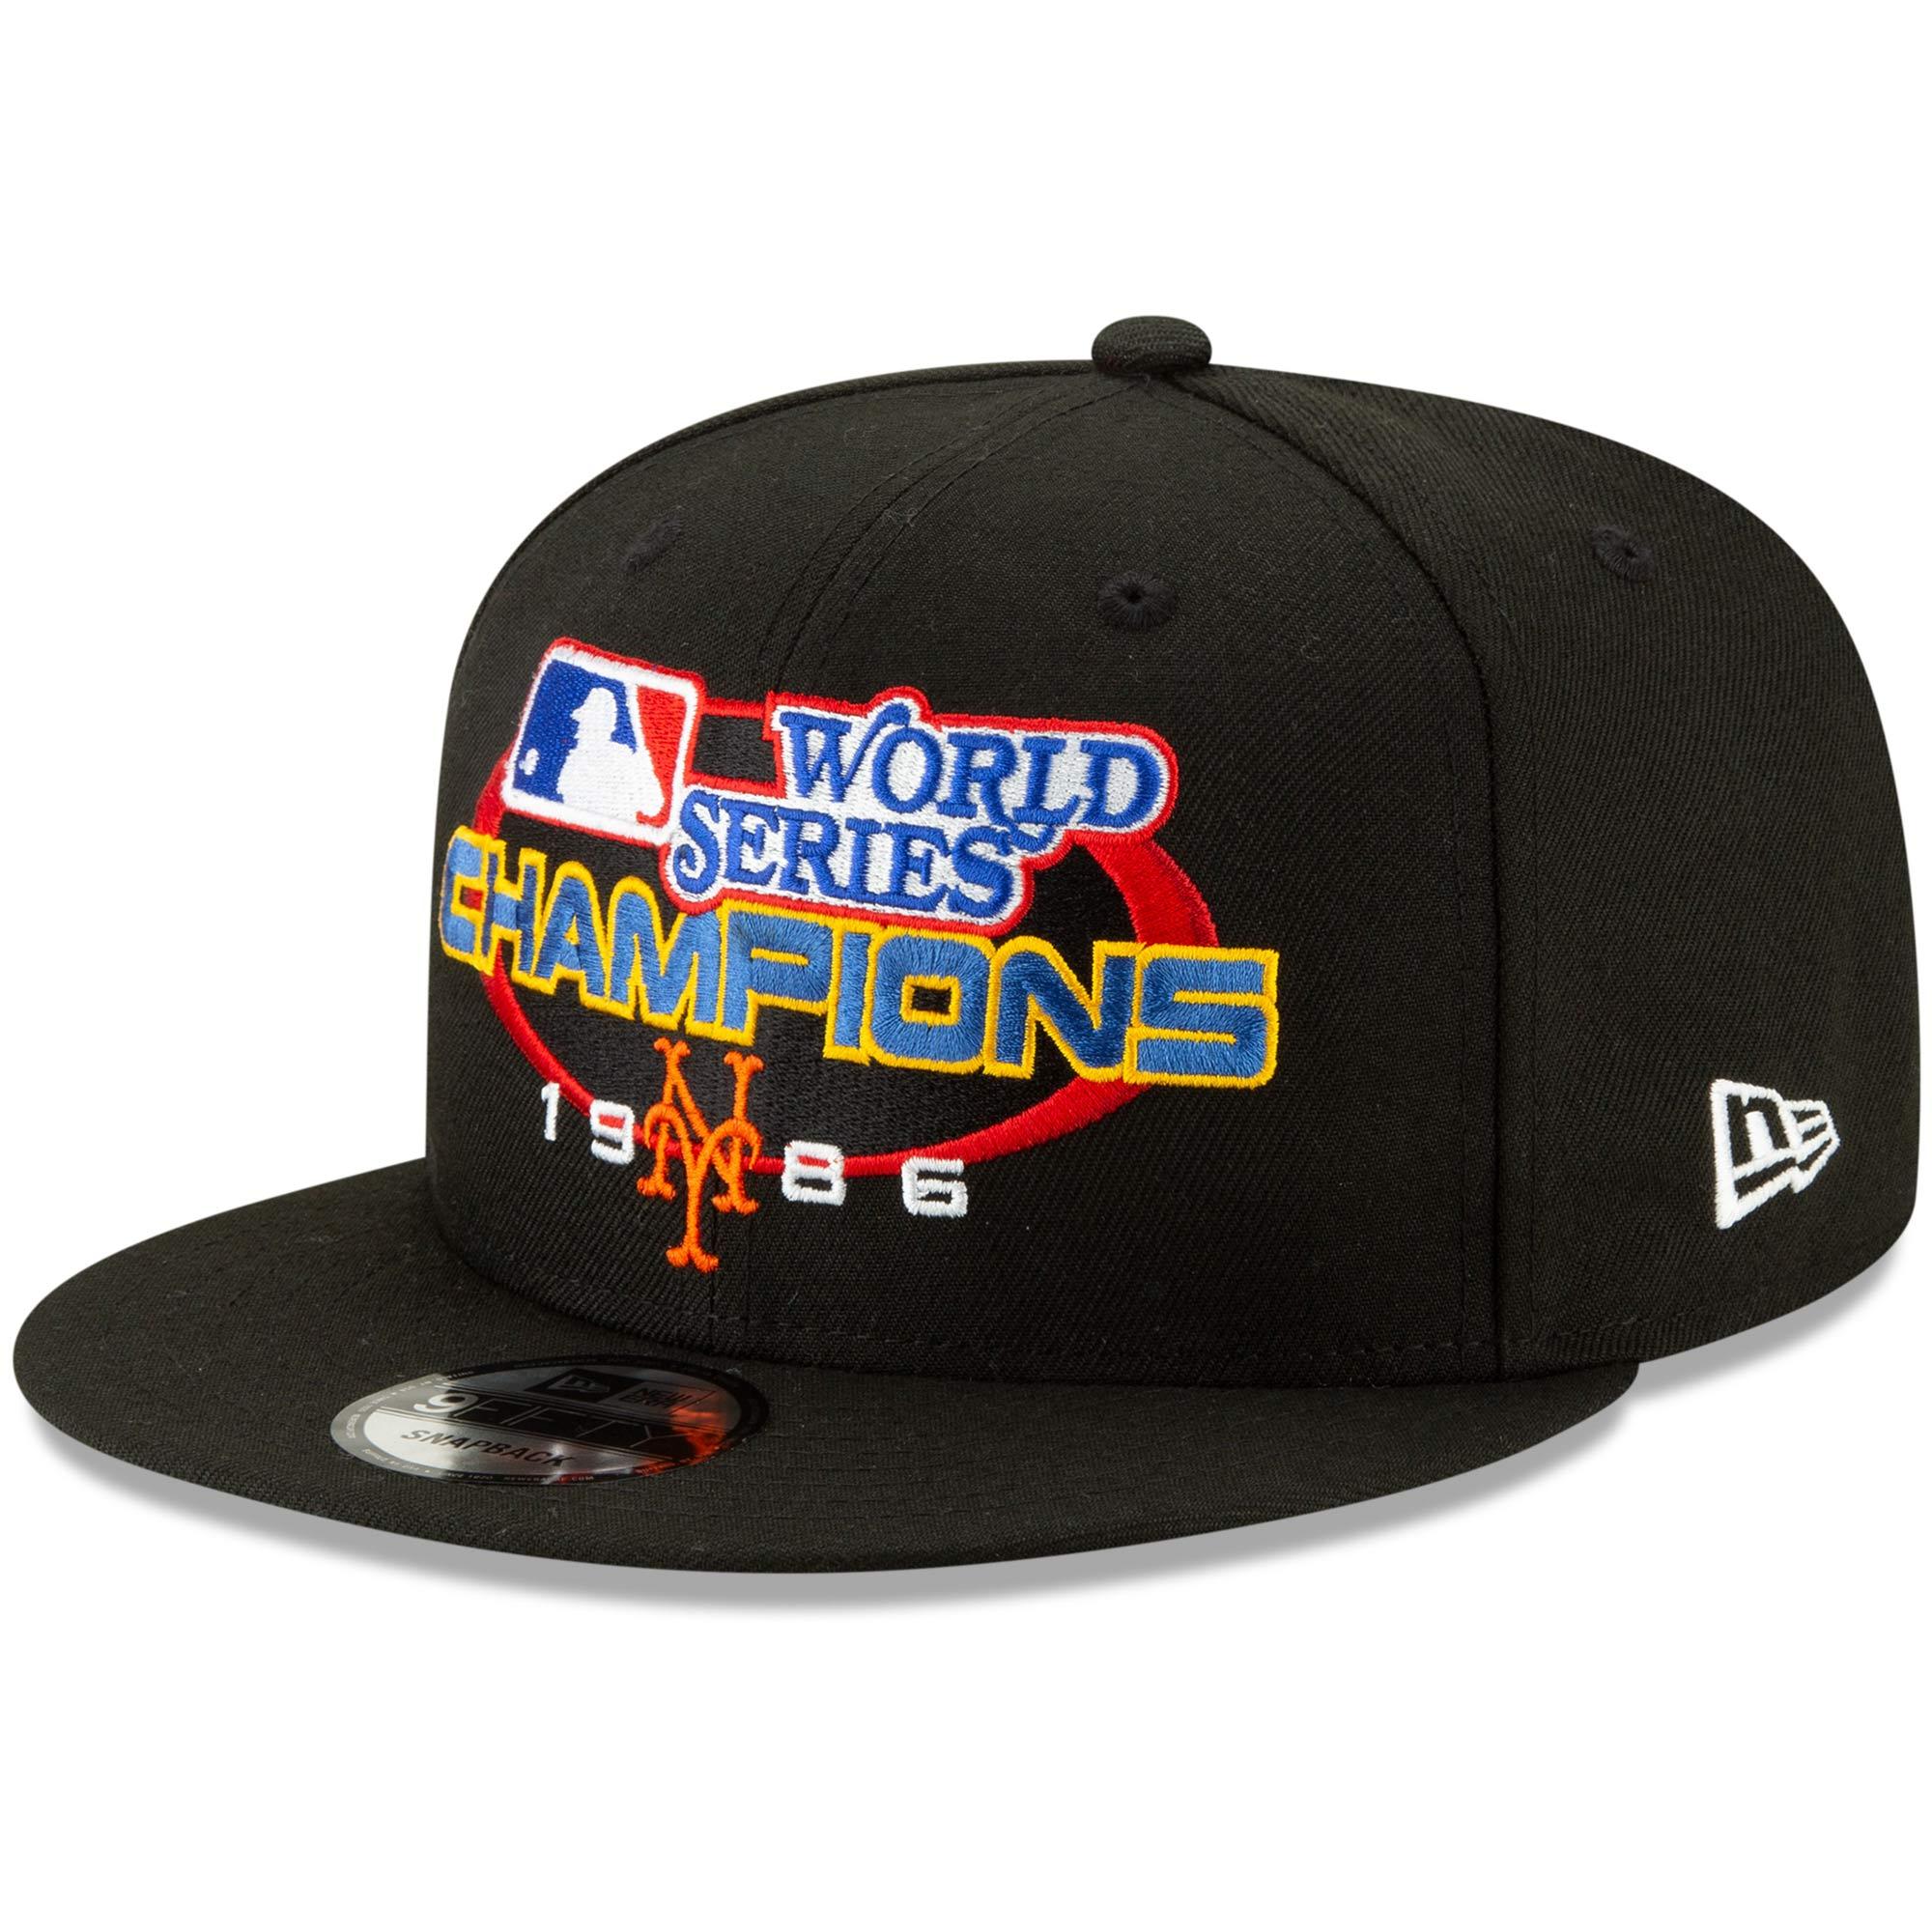 New York Mets New Era World Series Champions Flashback 9FIFTY Adjustable Snapback Hat - Black - OSFA